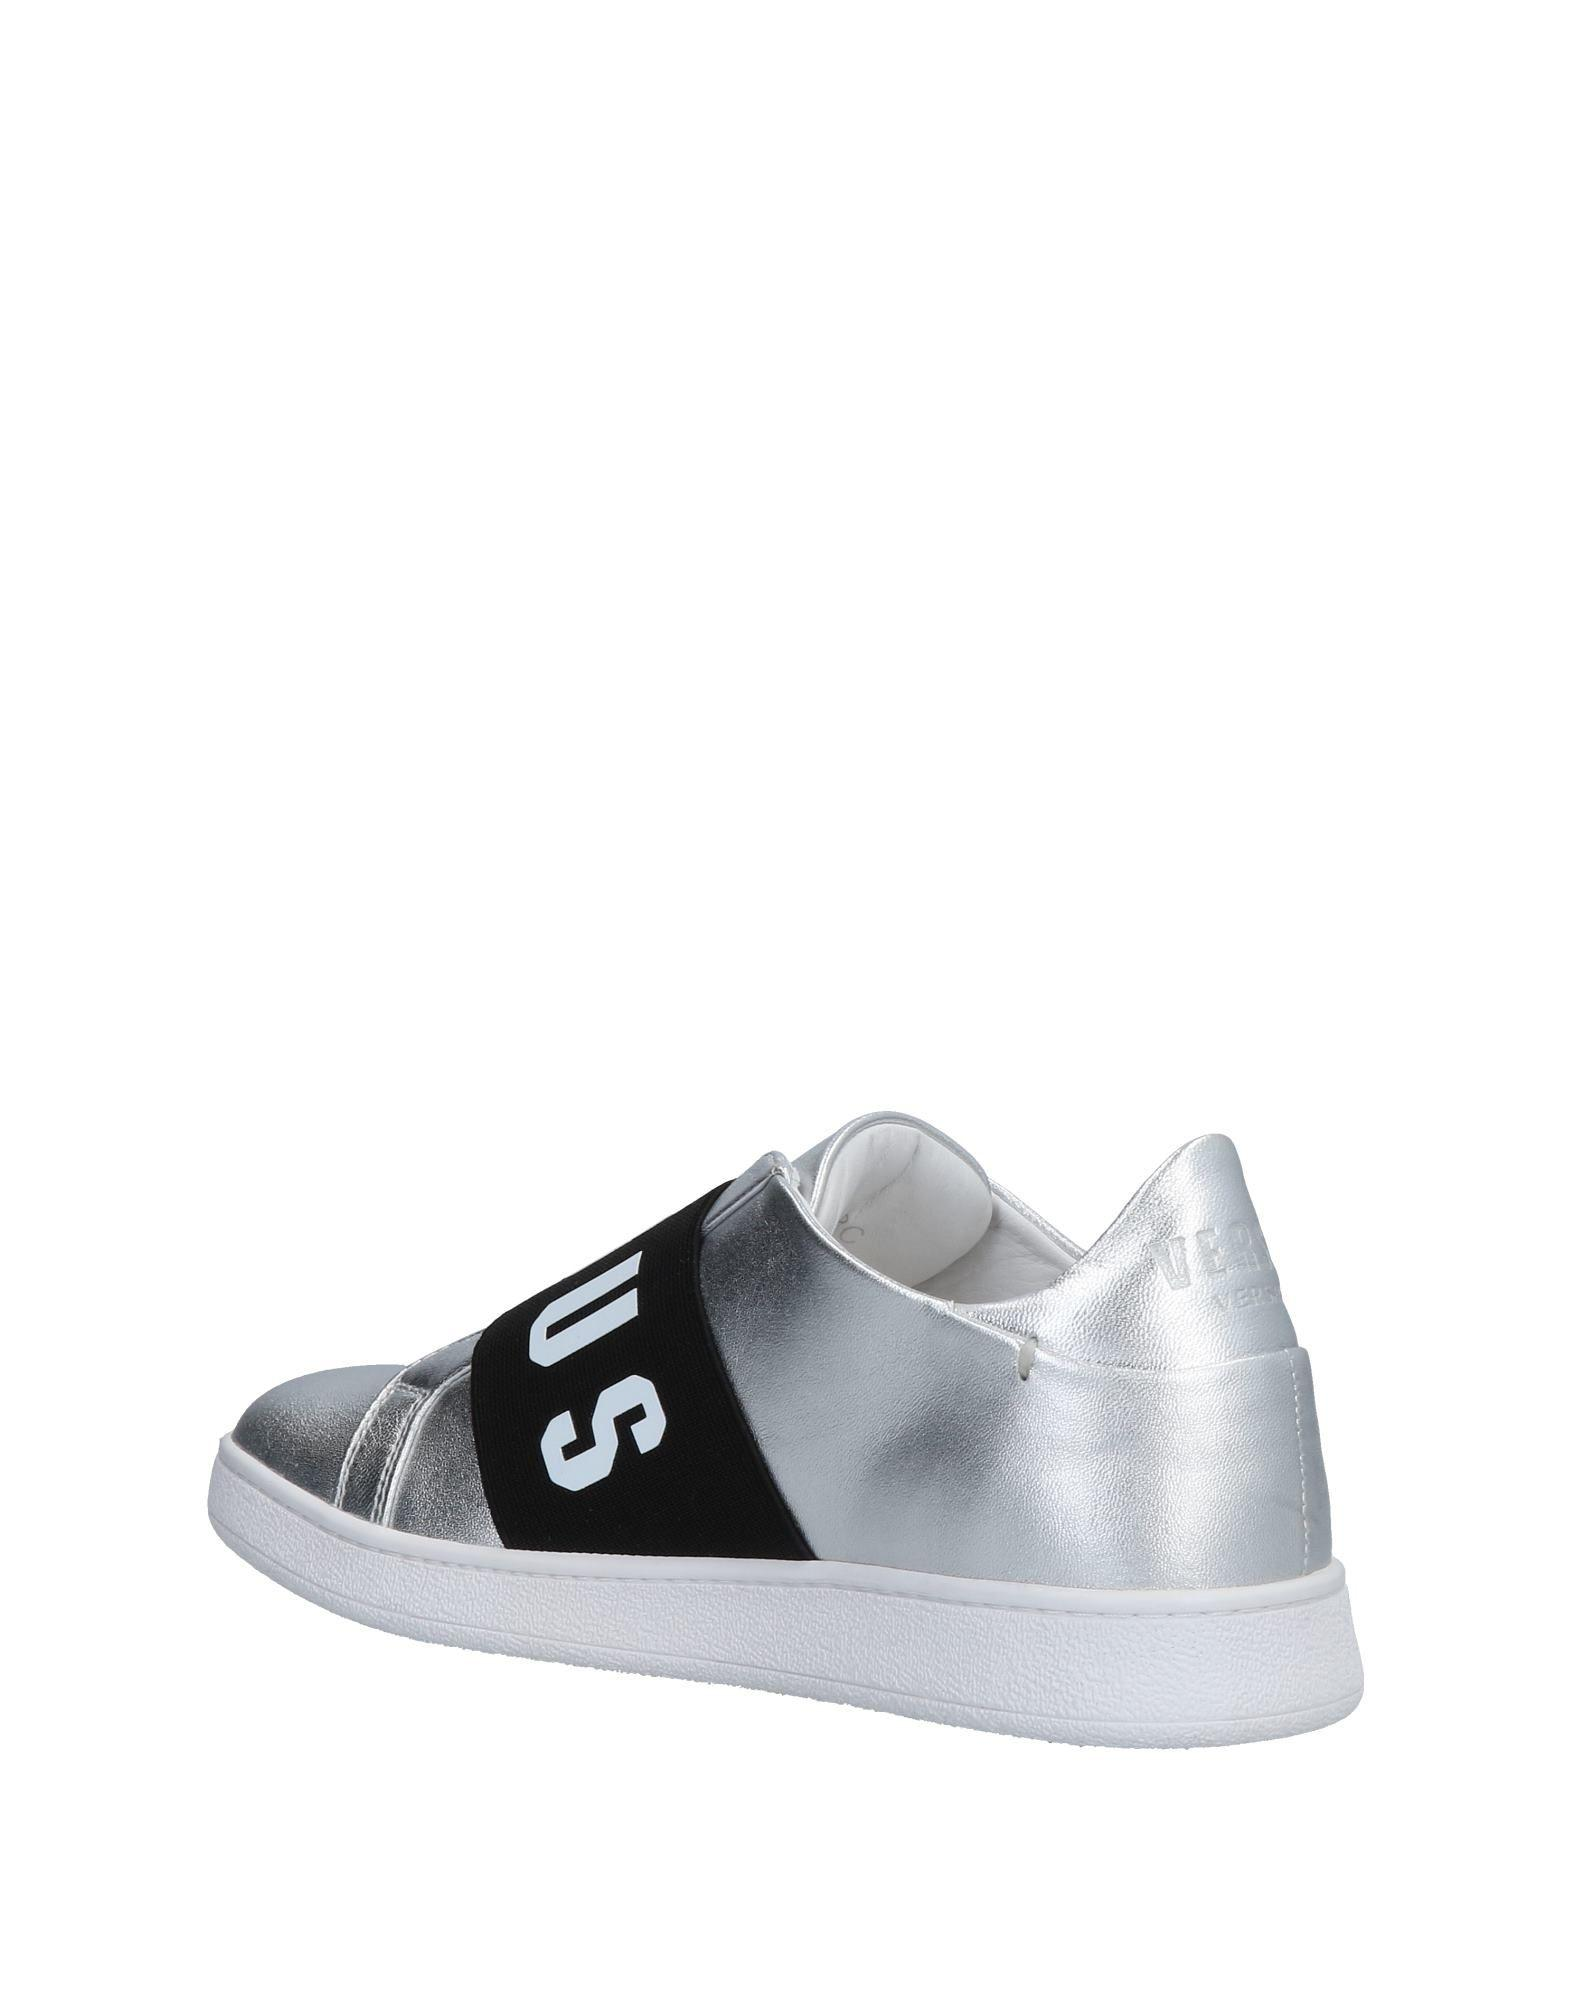 Versus Leather Low-tops & Sneakers in Silver (Metallic)